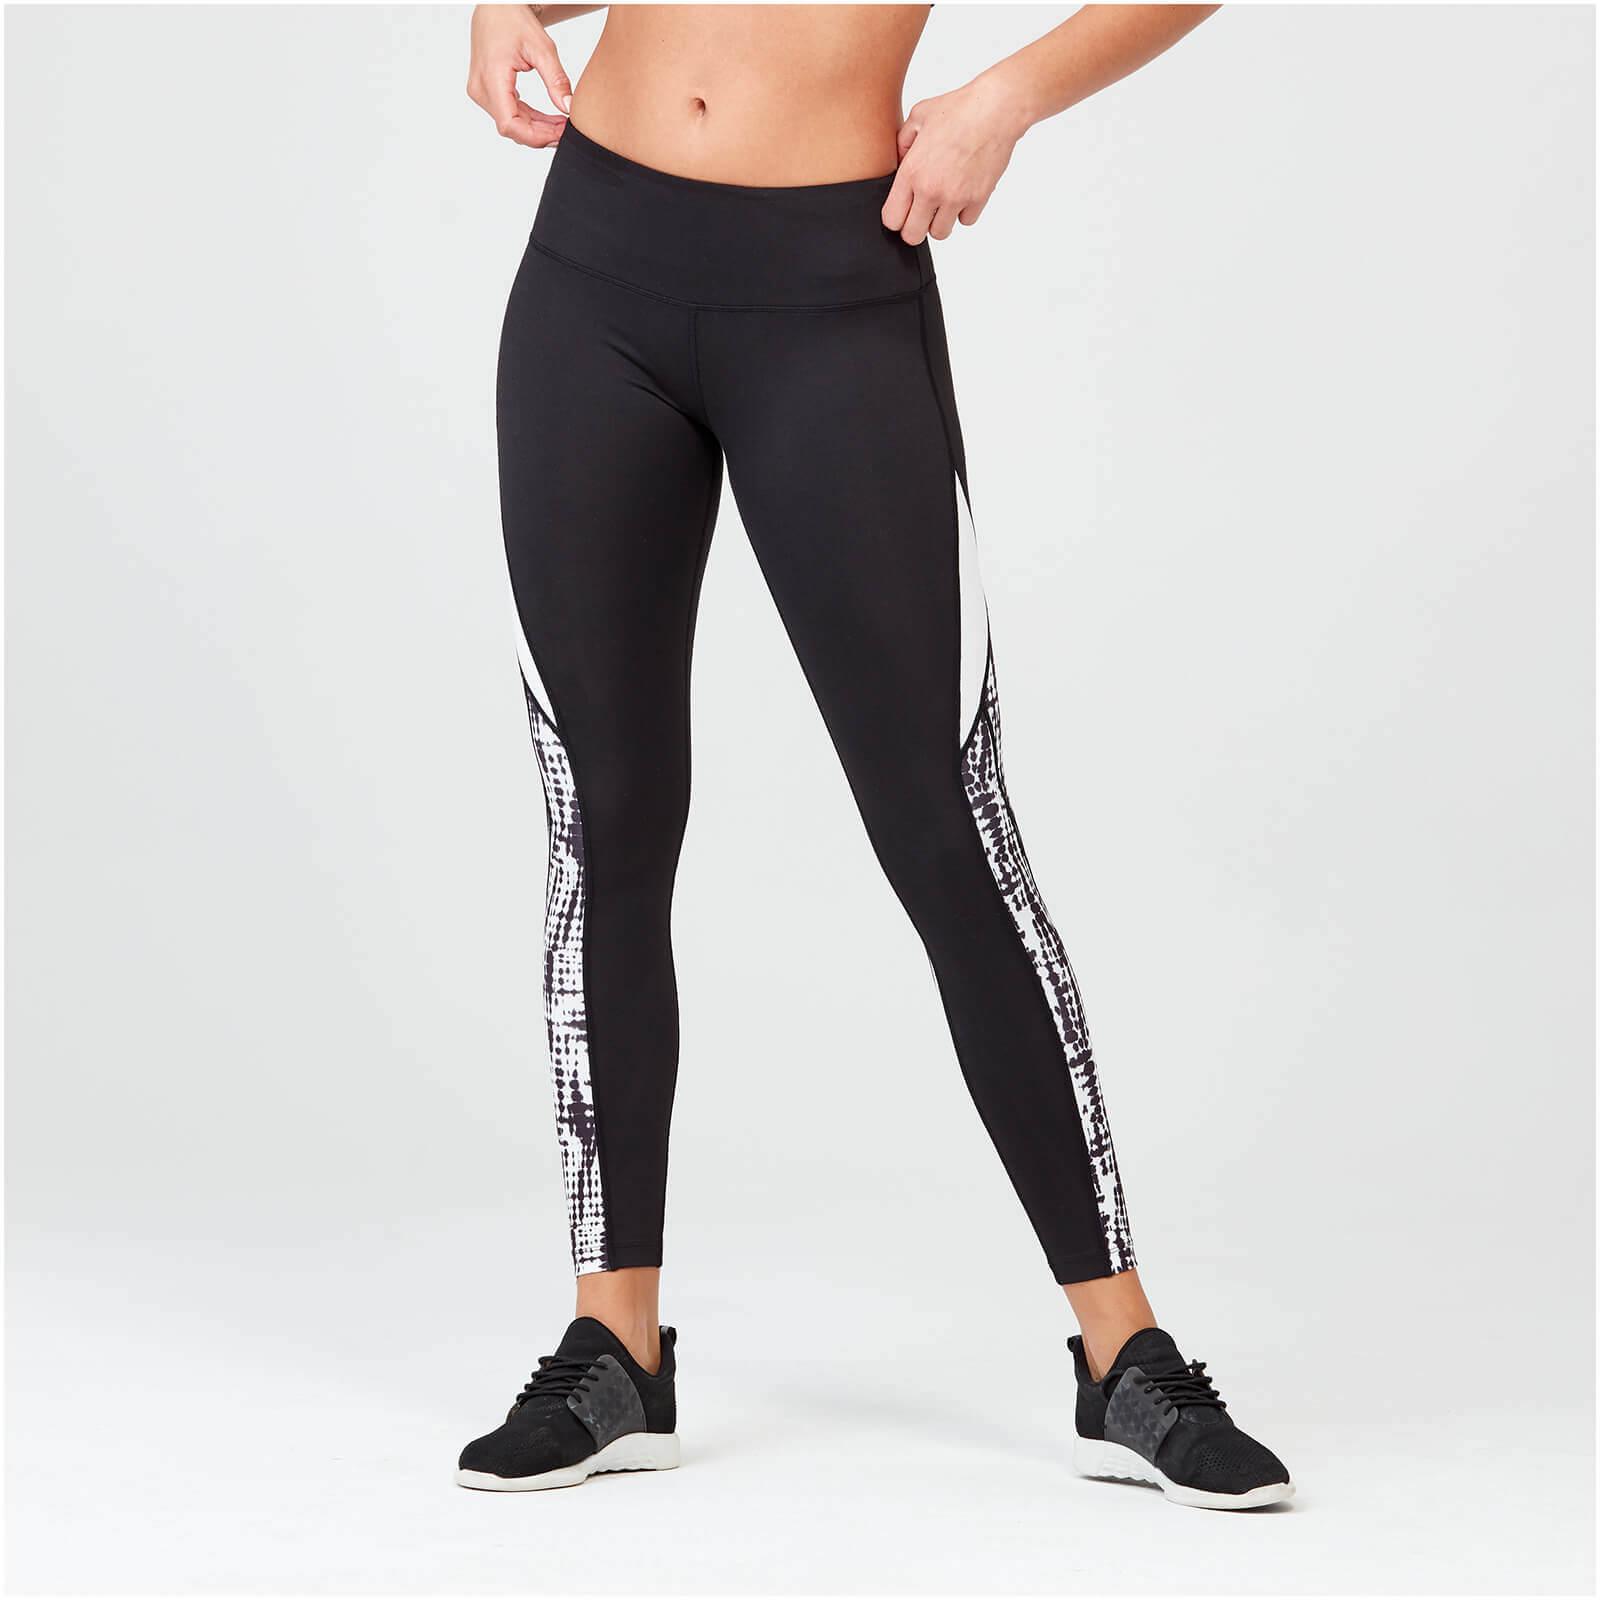 760744aae1565 Buy Women's Squat-Proof Training Leggings   Myprotein.com